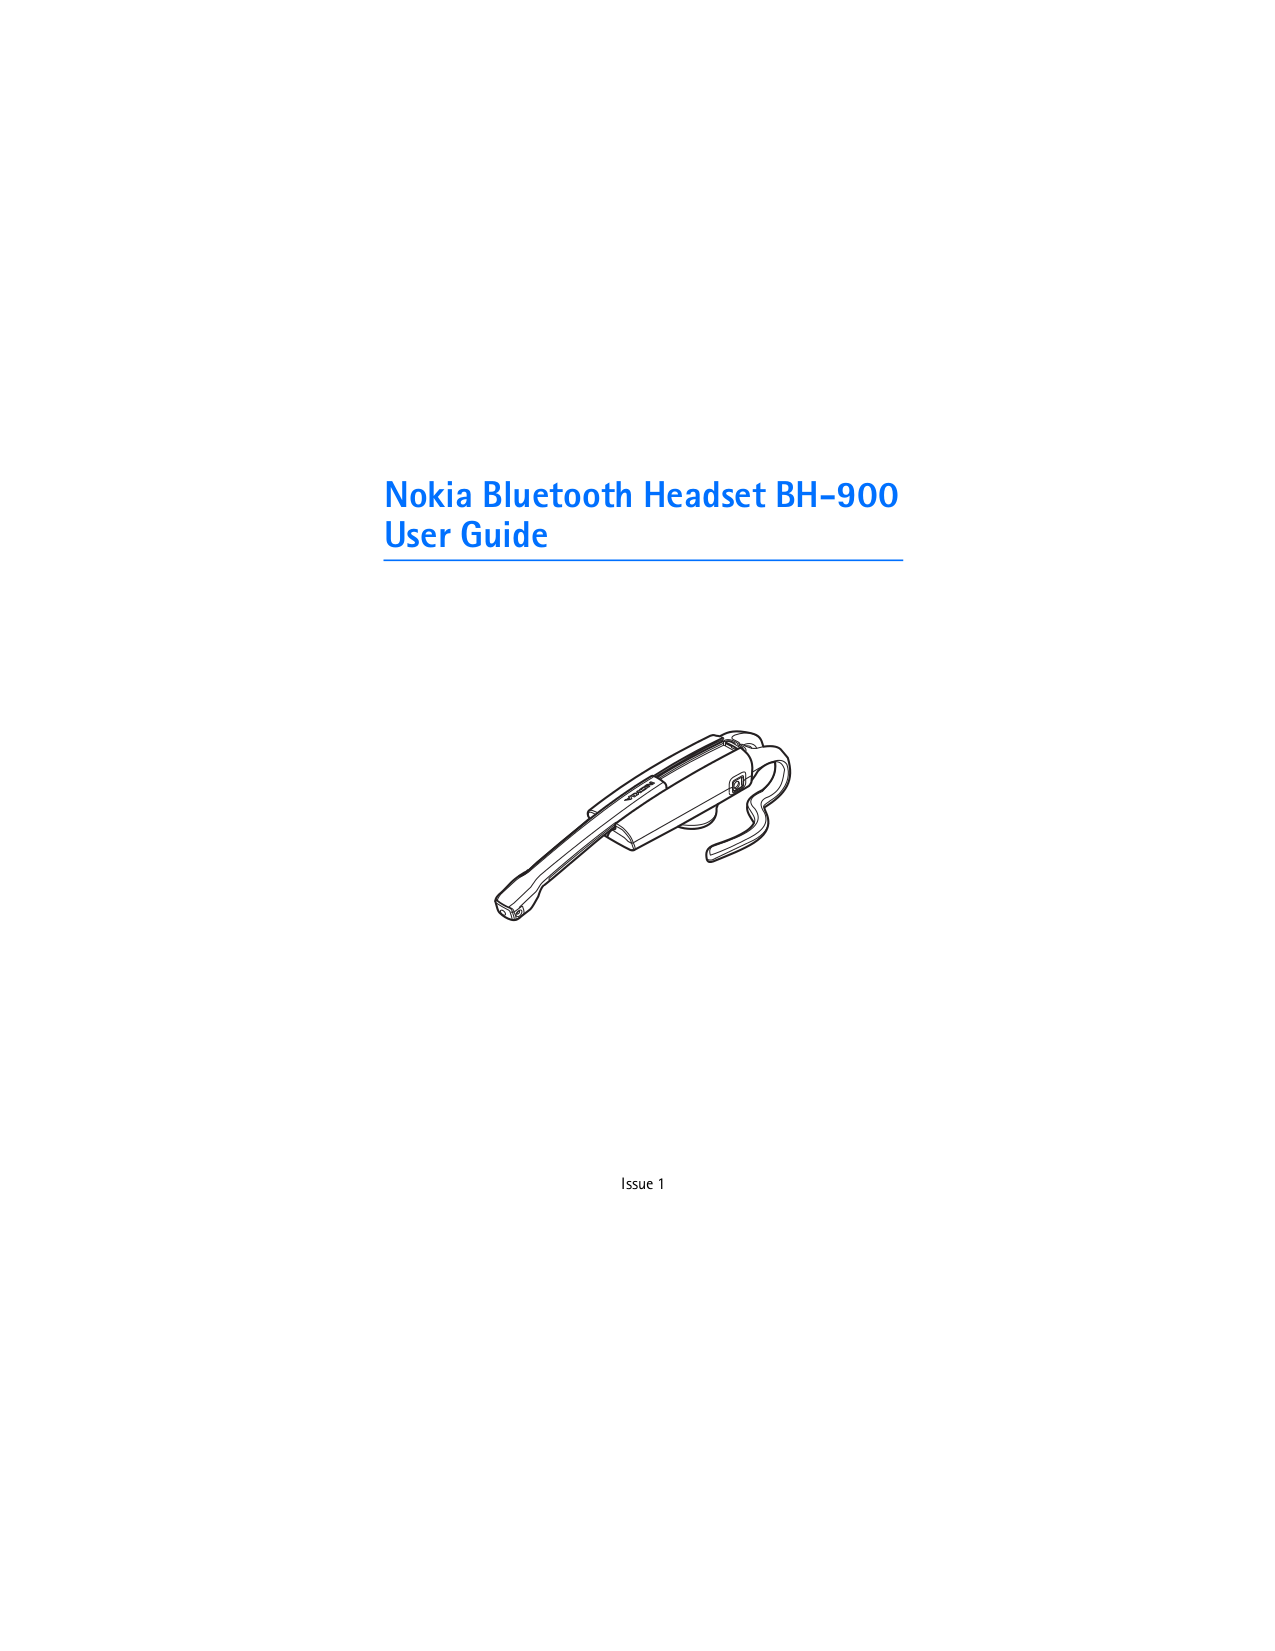 pdf for Nokia Headset BH-904 manual